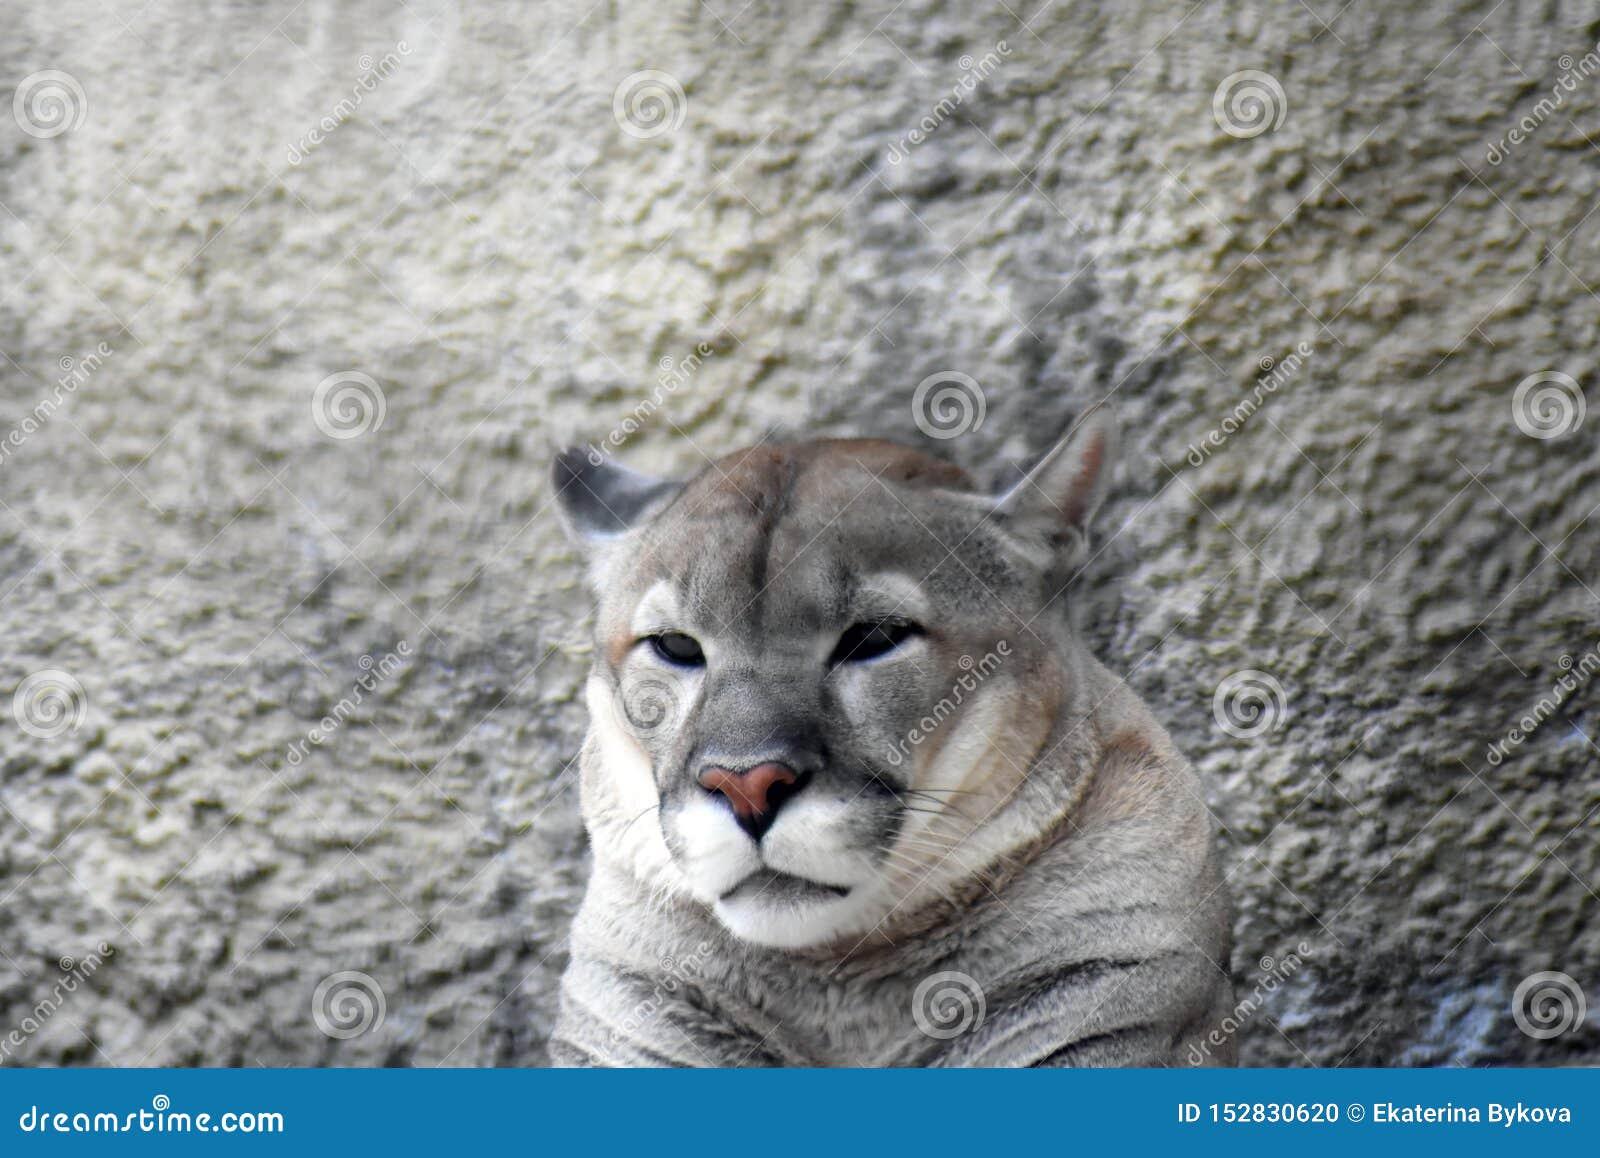 Puma animal portrait at grey stone wall background.